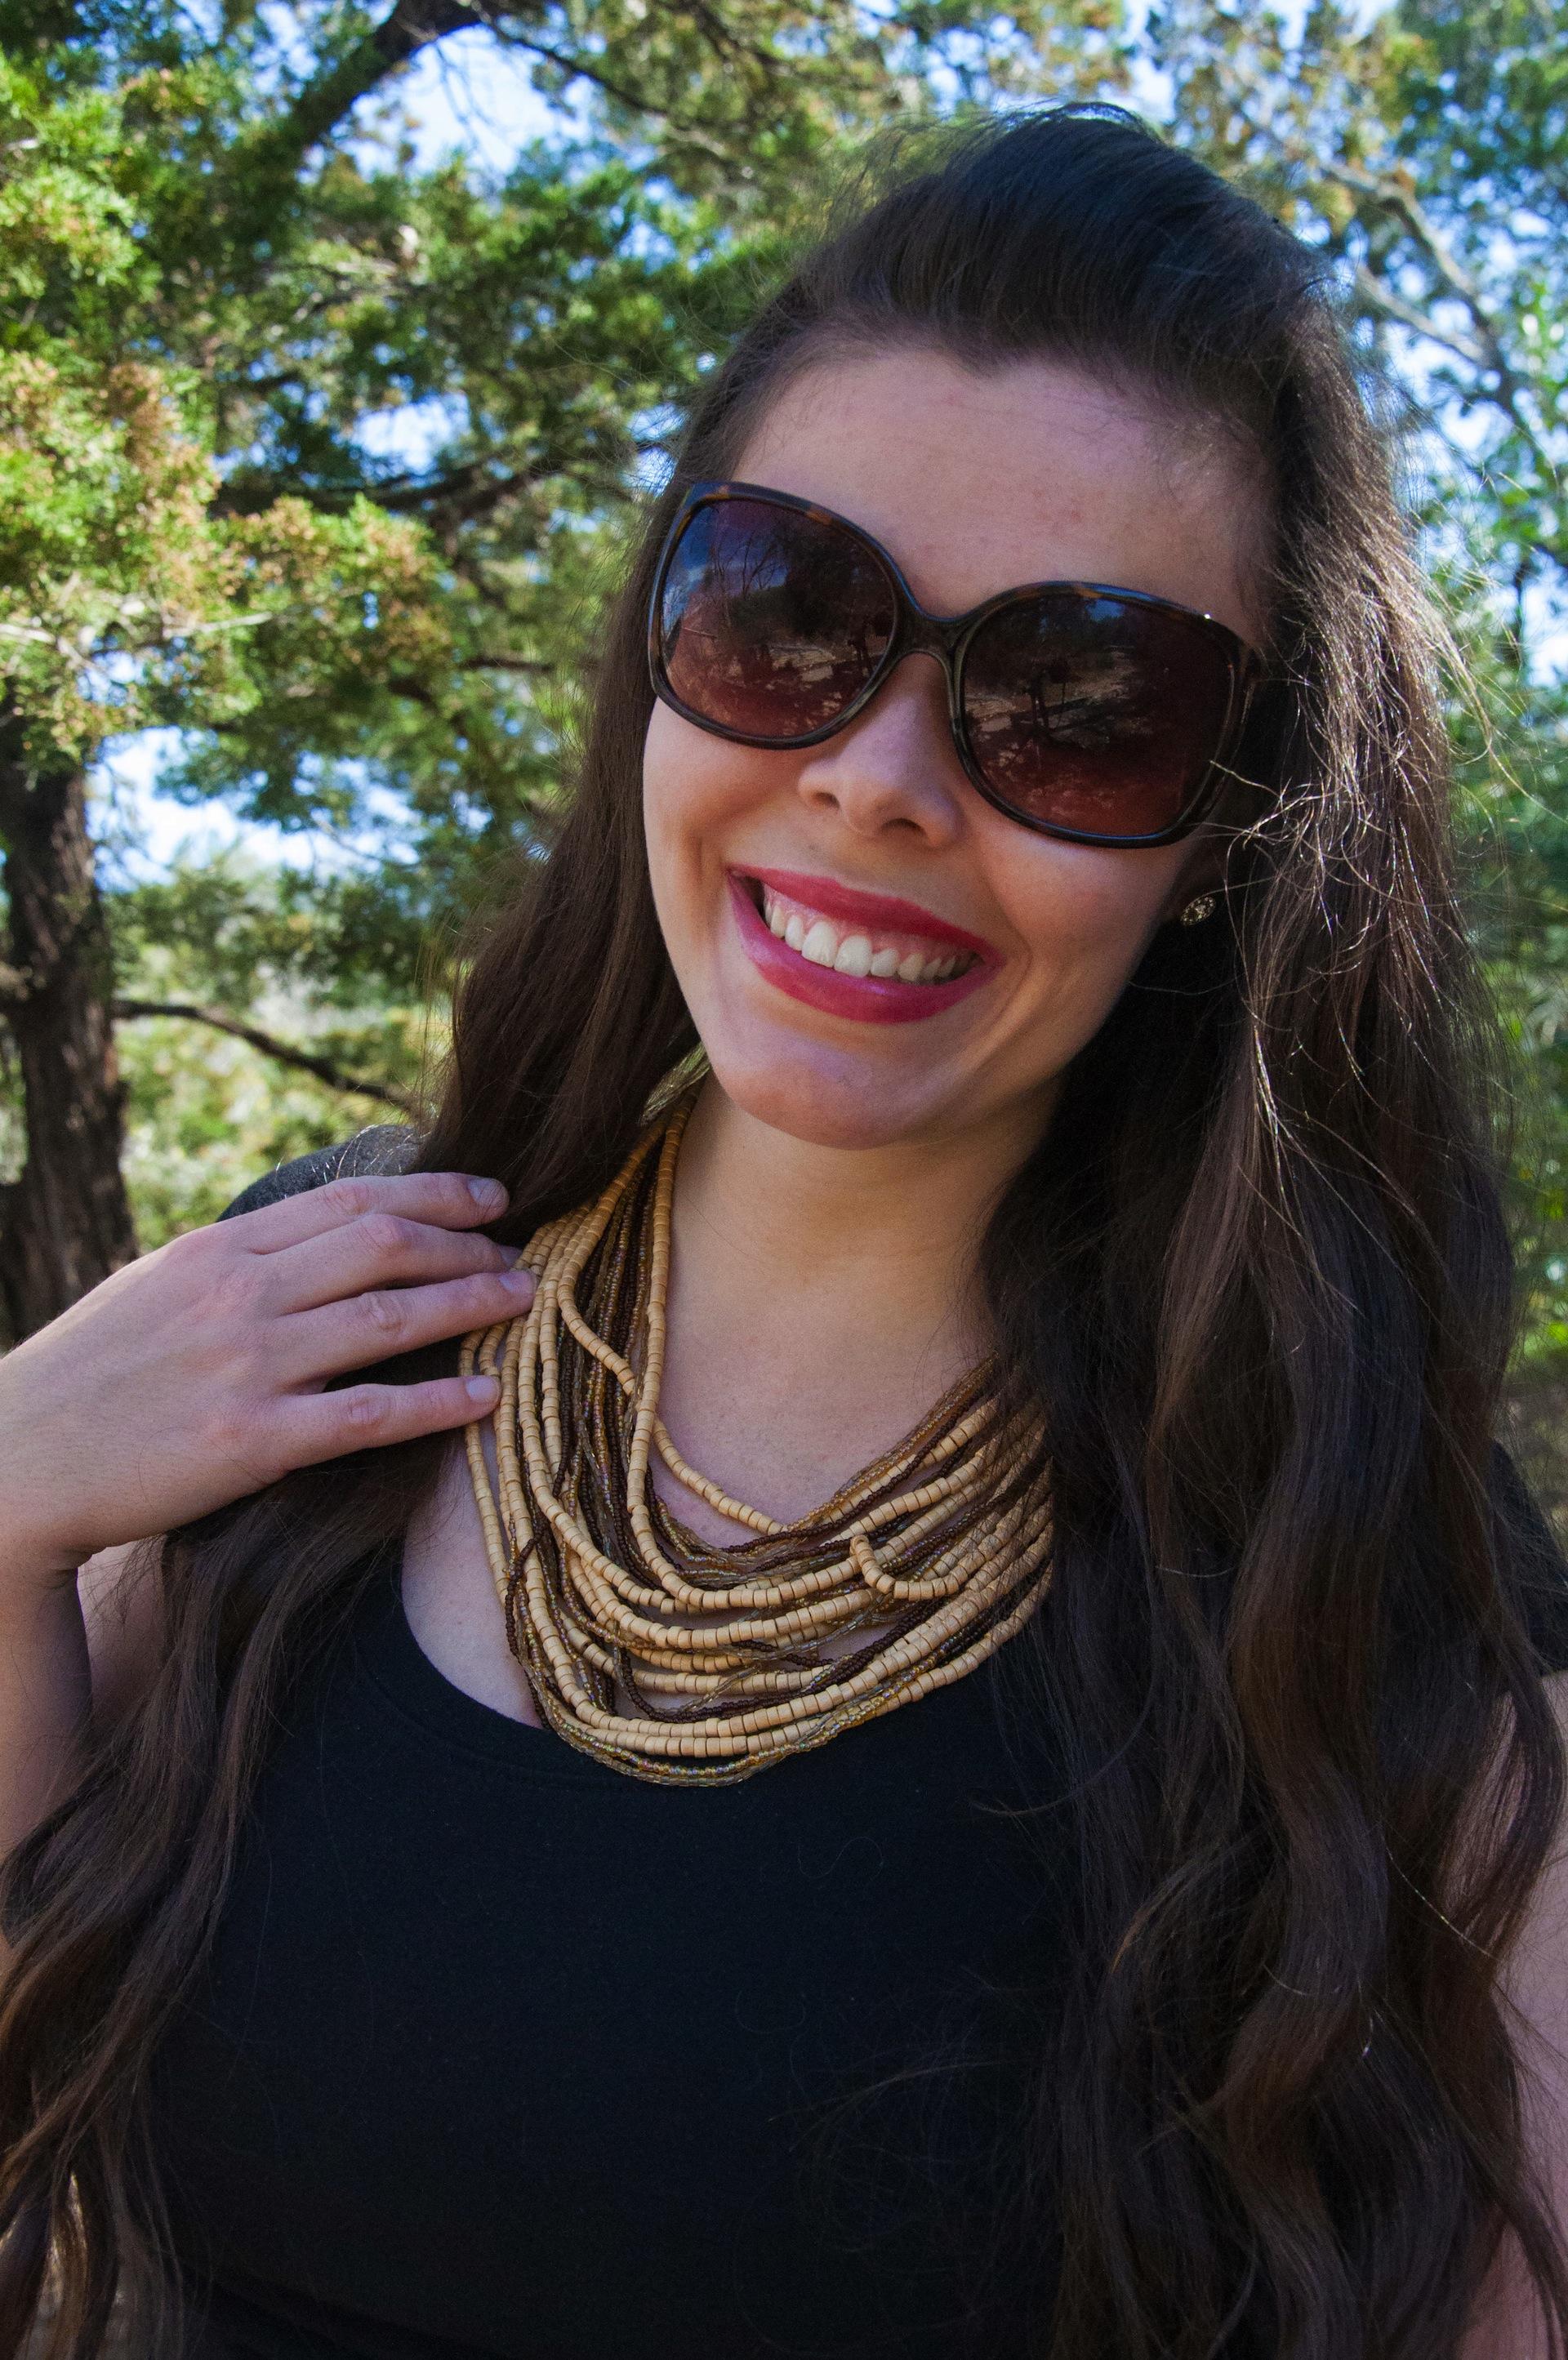 Big brown beaded necklace